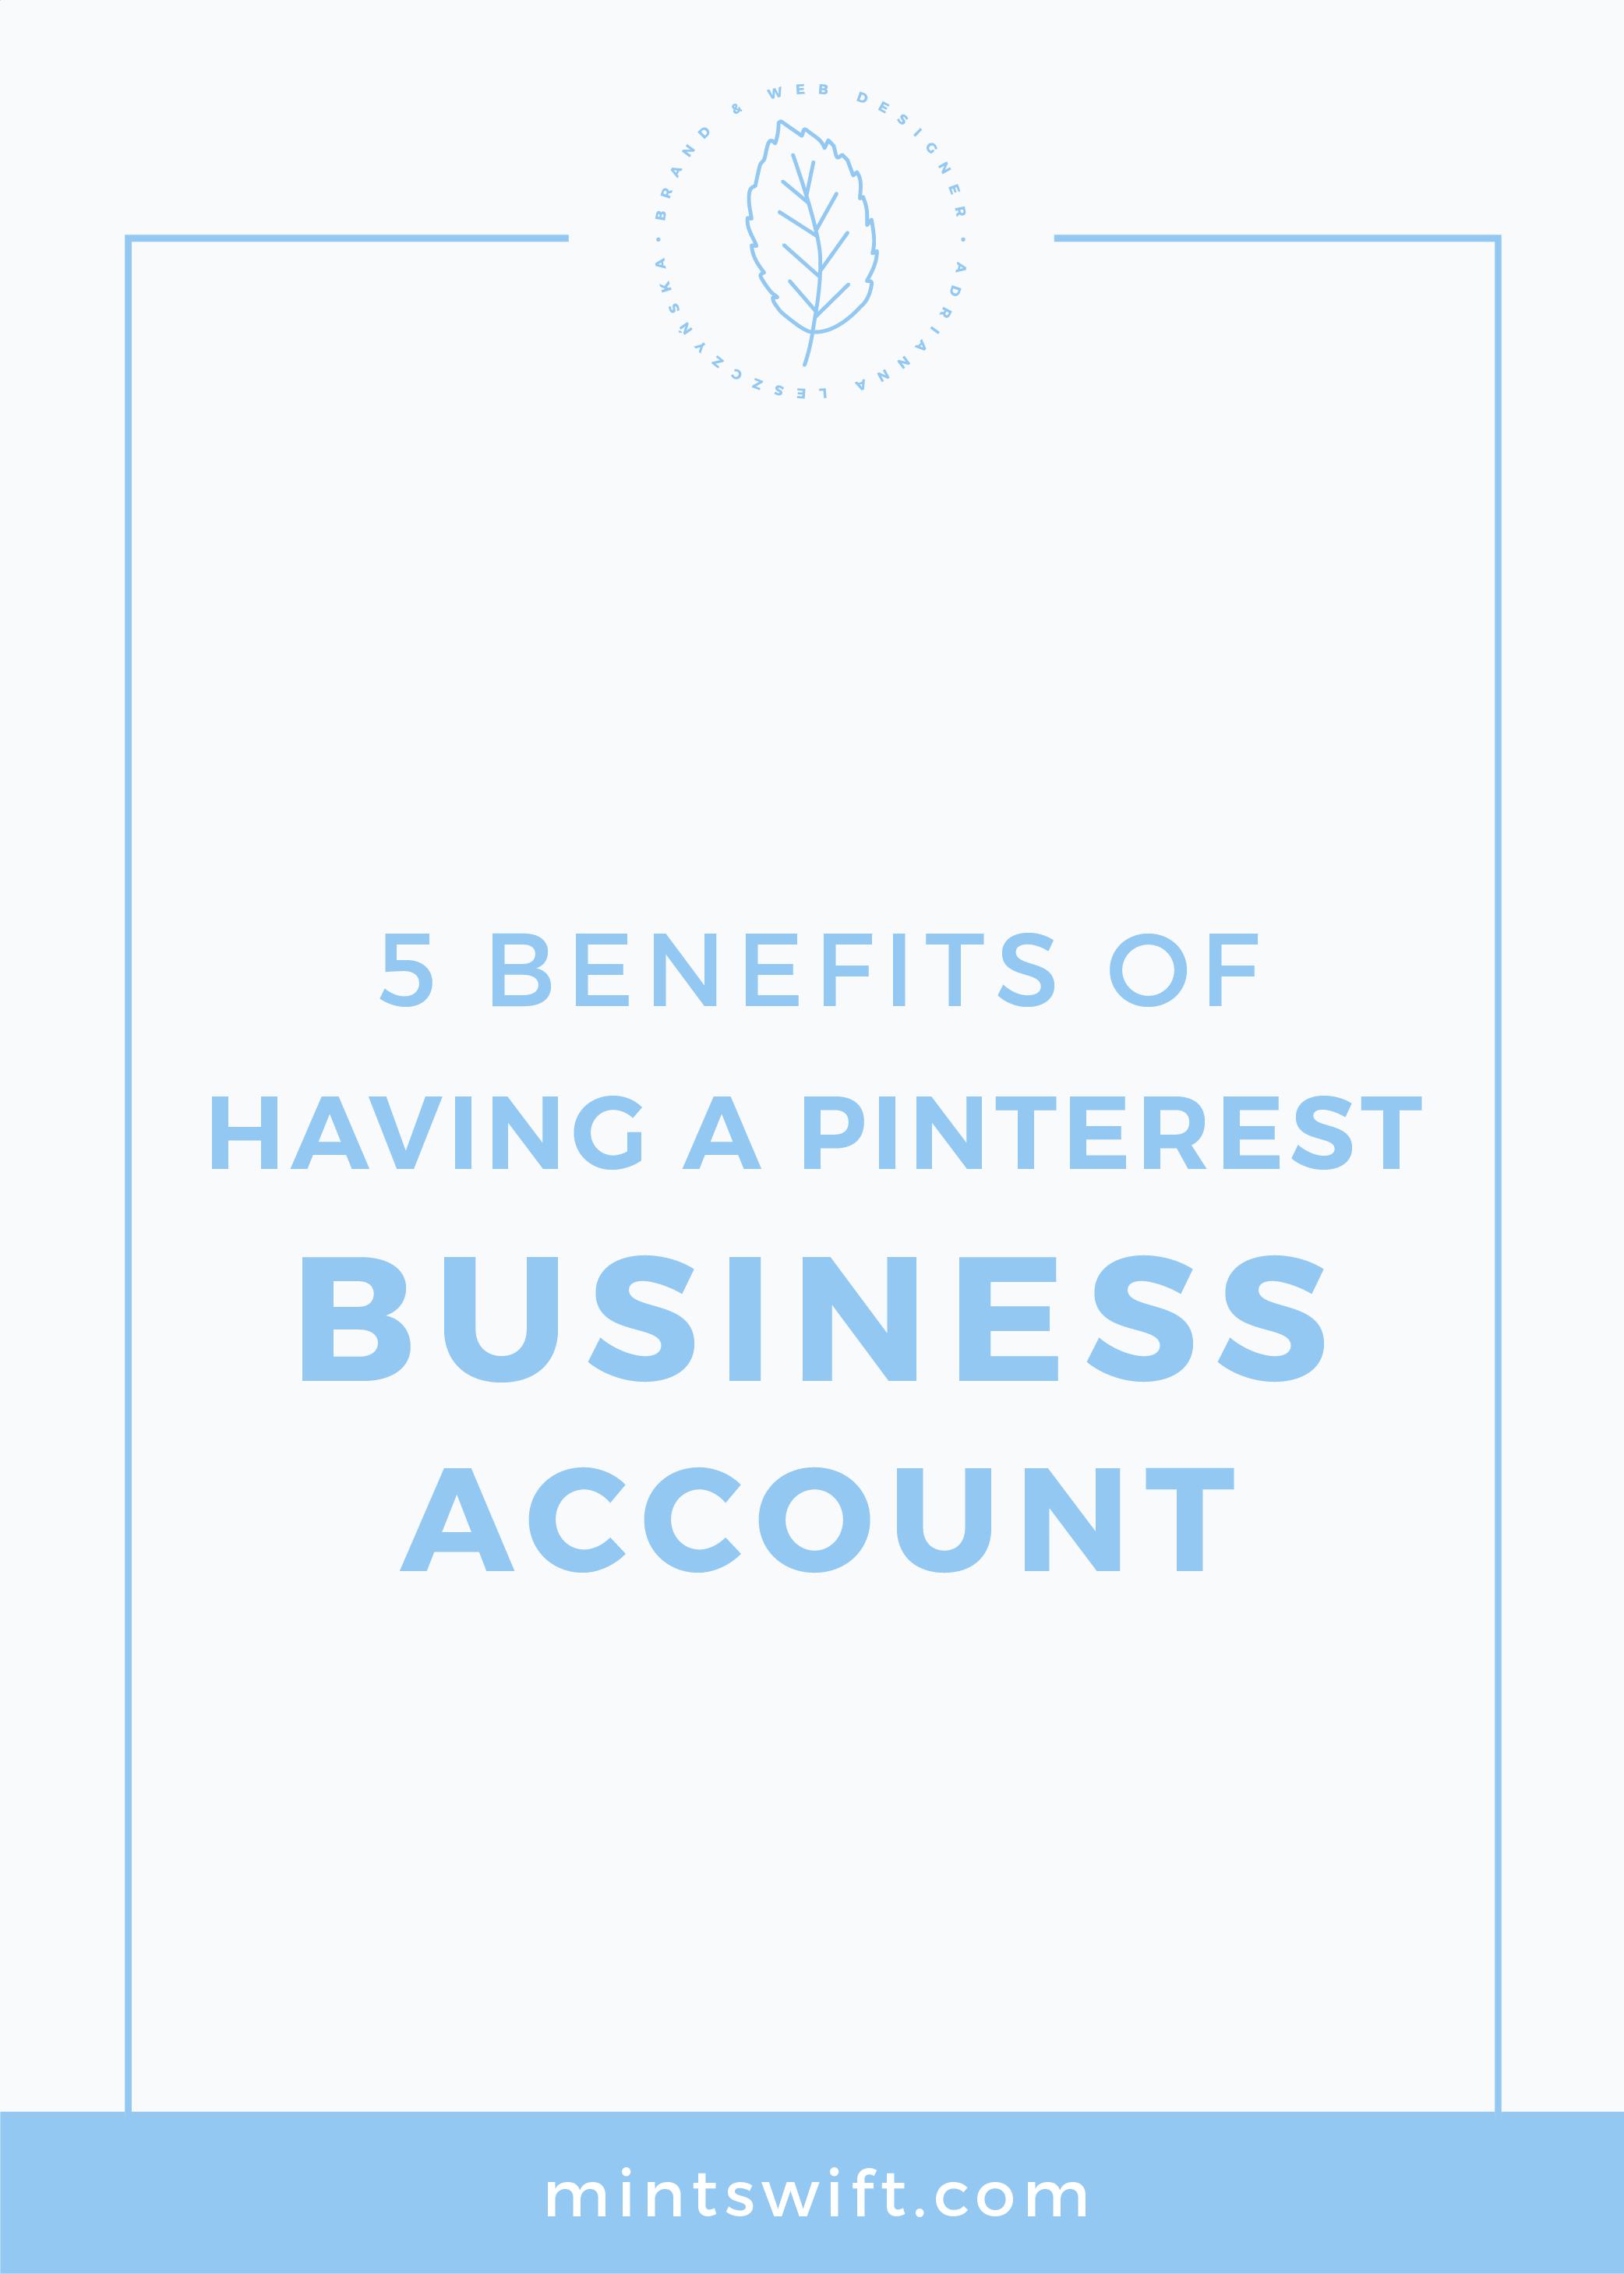 5 Benefits of Having a Pinterest Business Account MintSwift